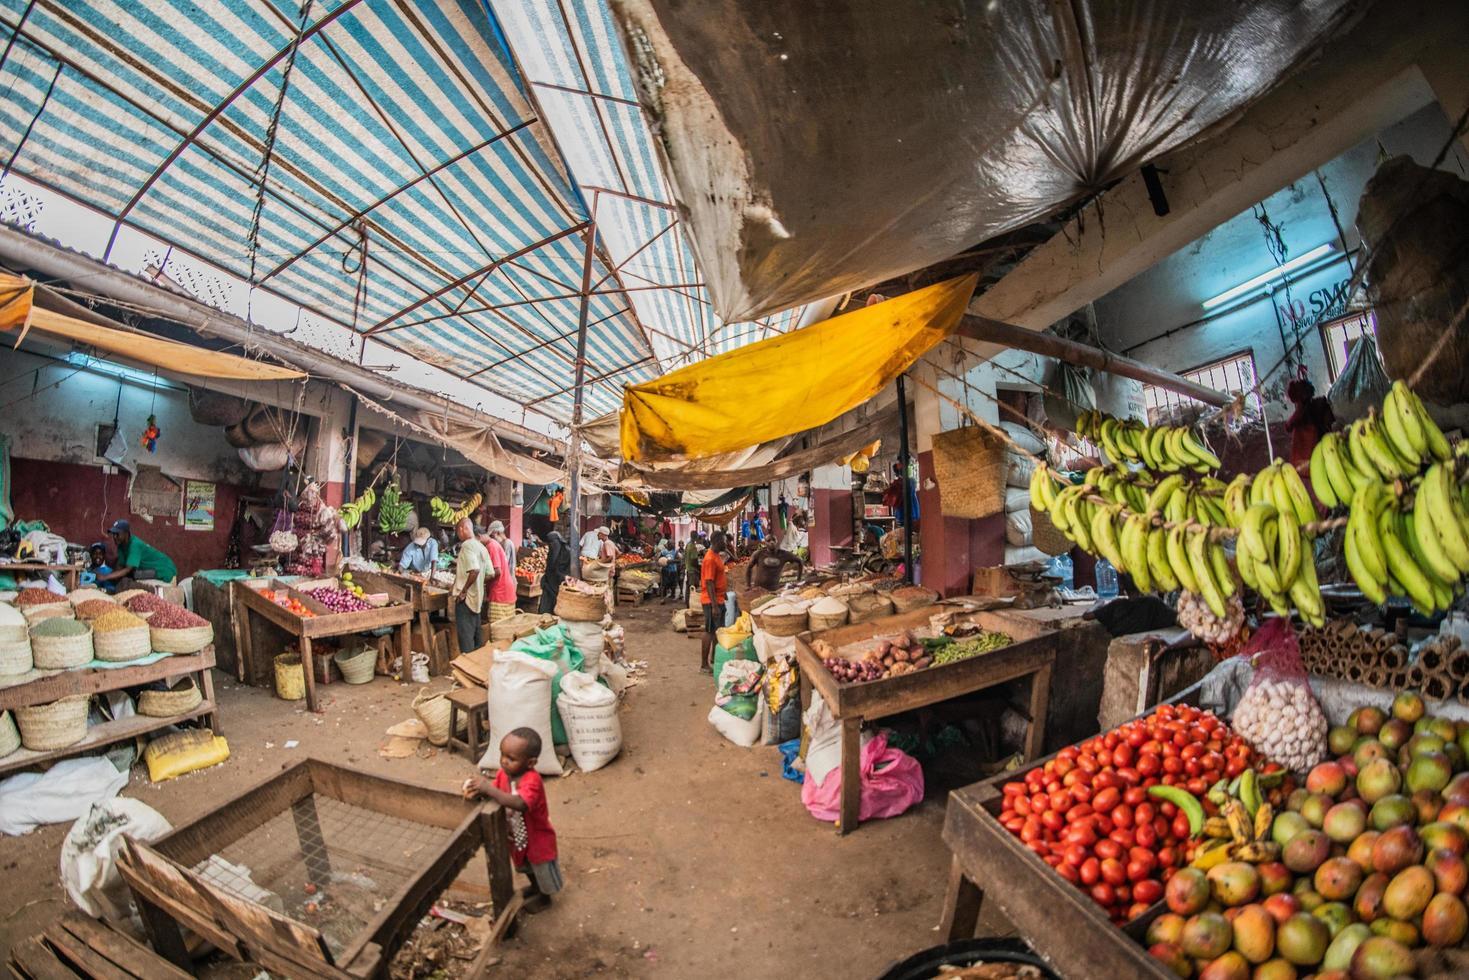 bazar del mercato agricolo in kenya foto